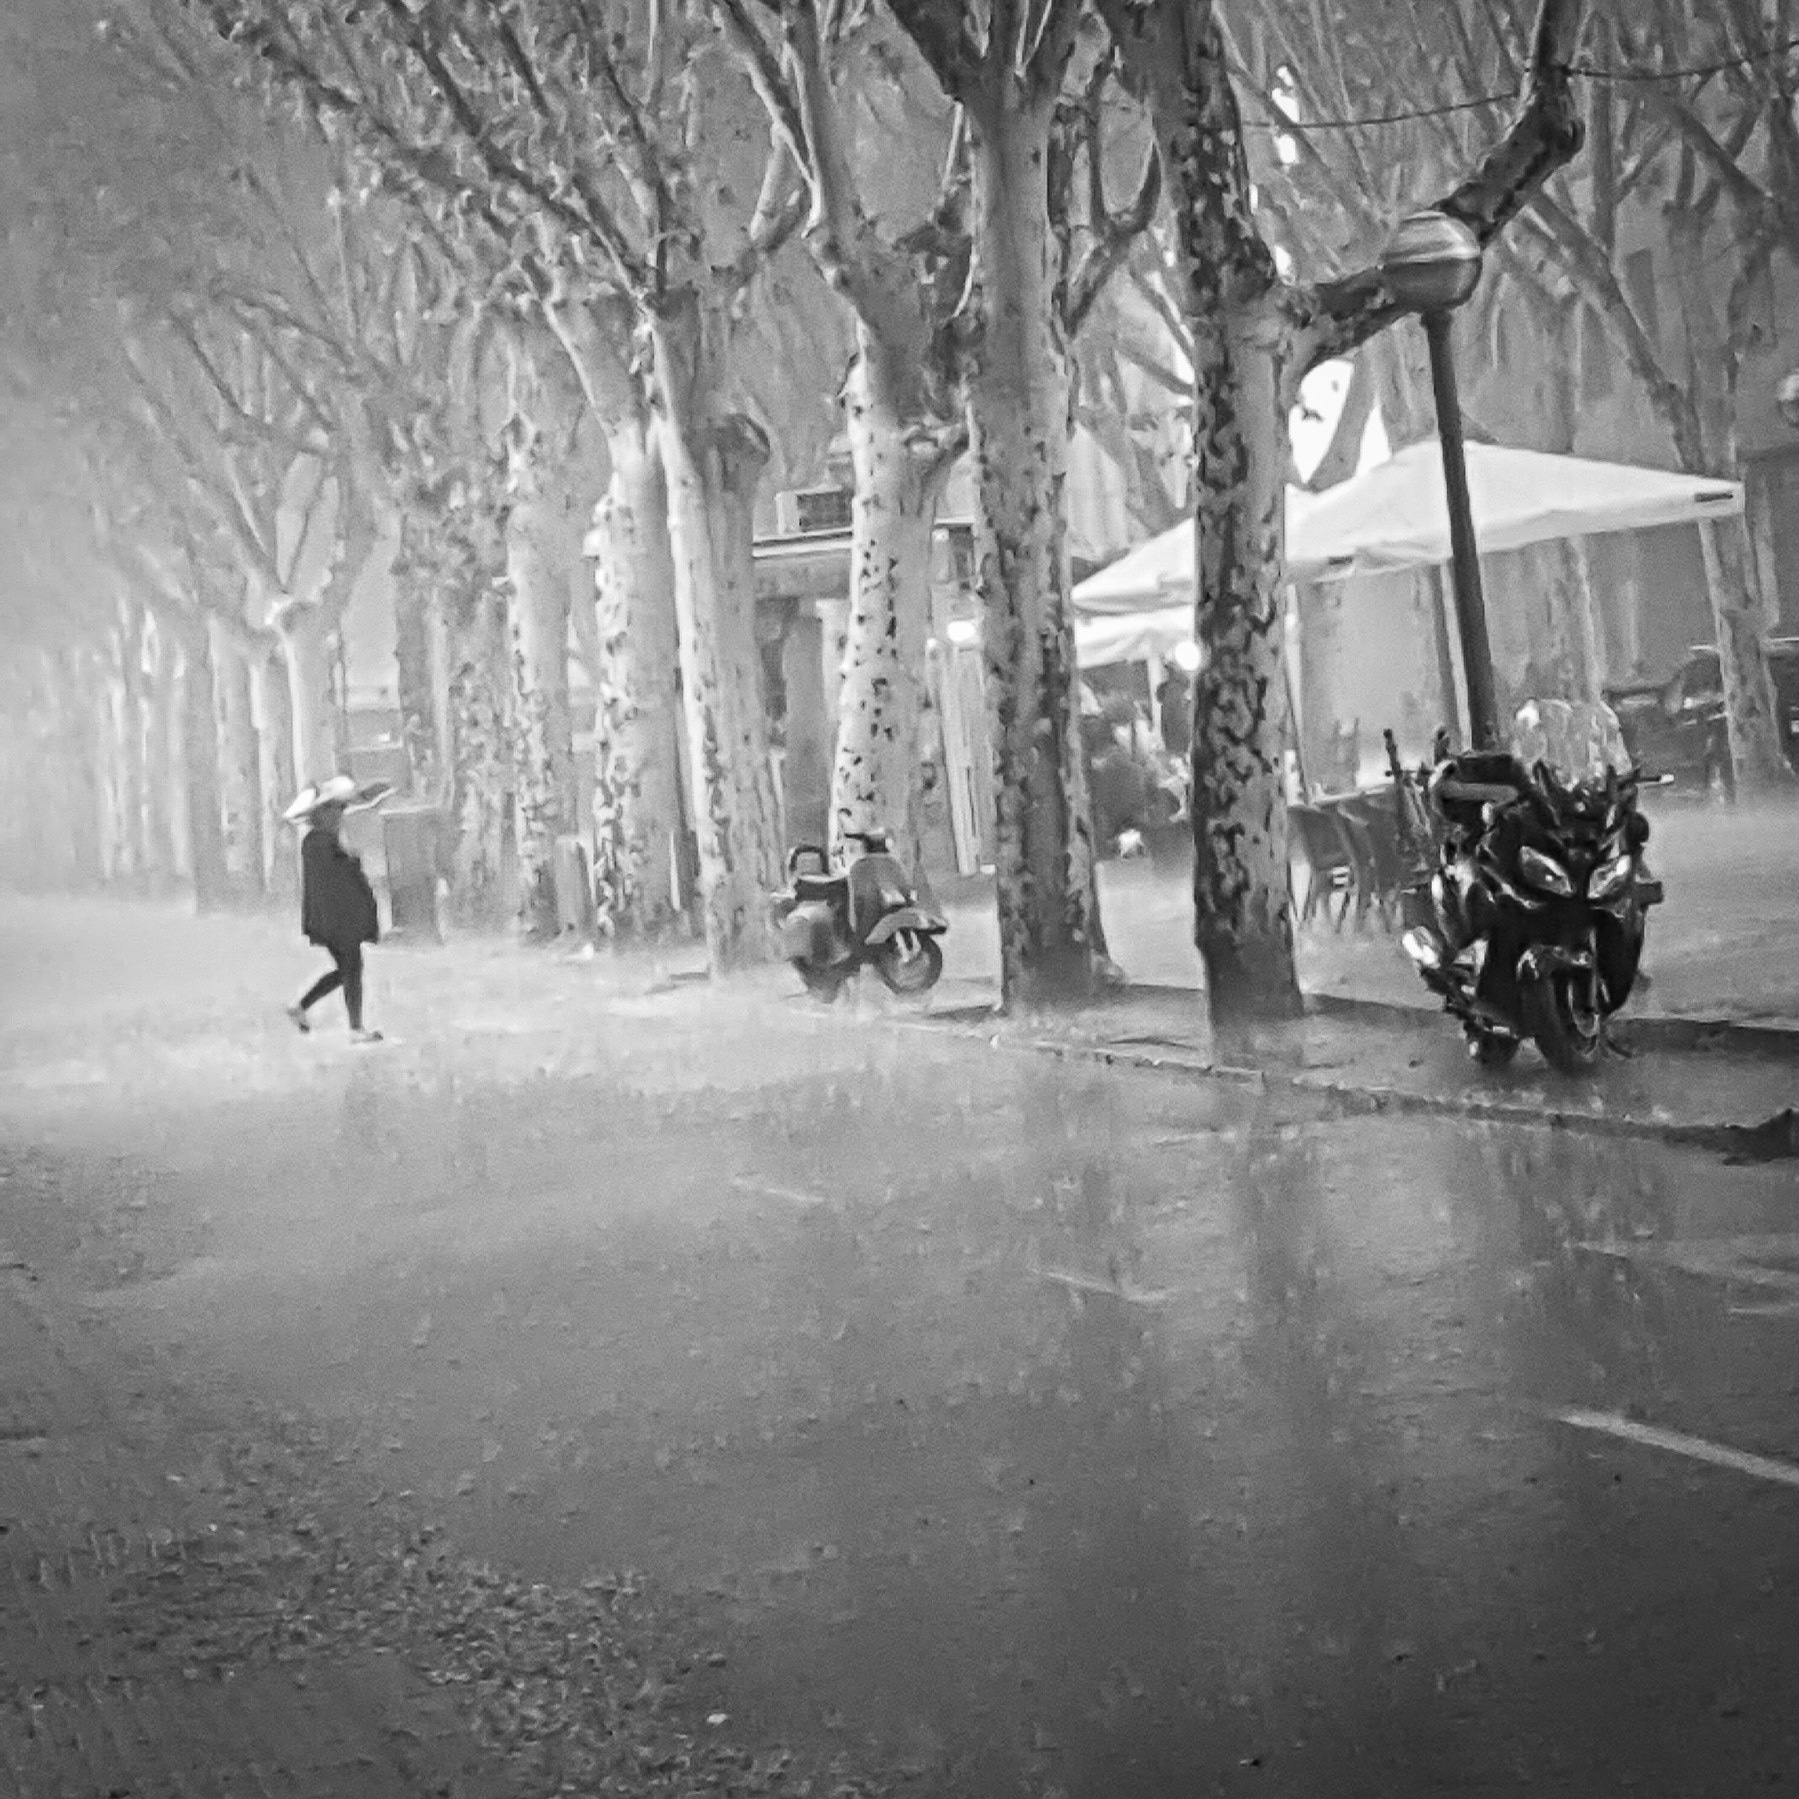 Mallorca rain swept street